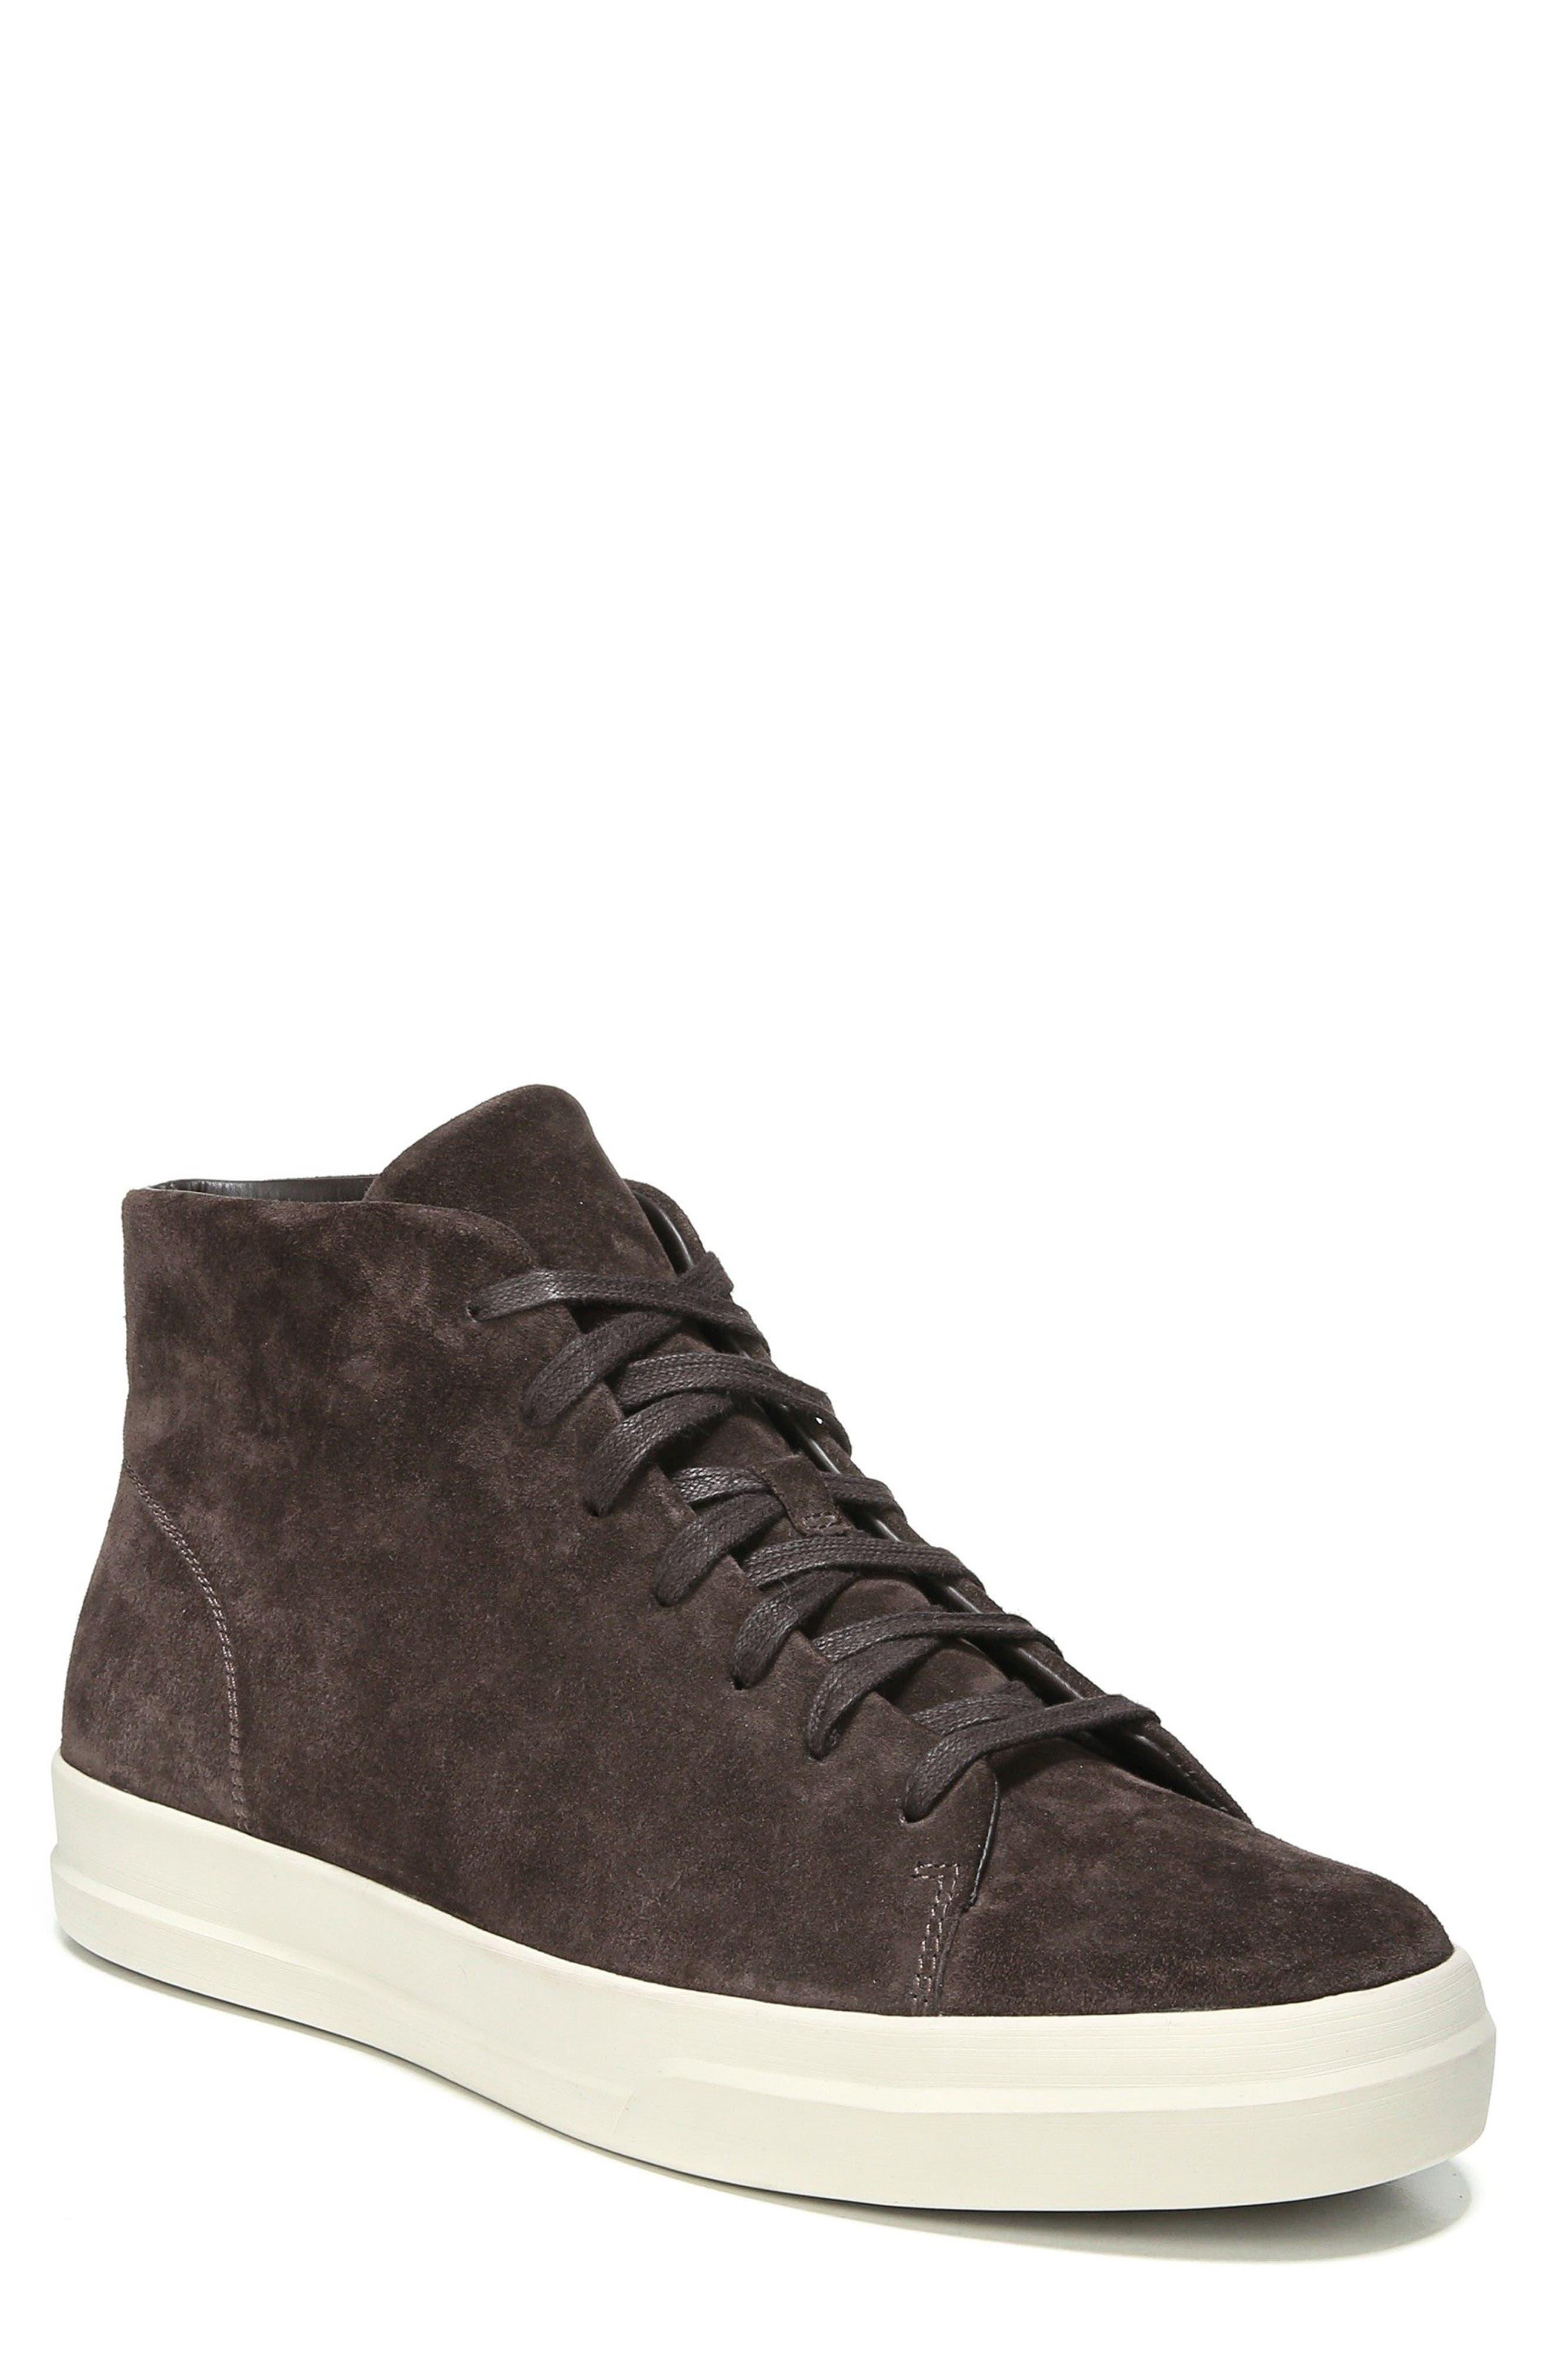 Cullen Sneaker,                         Main,                         color, Espresso